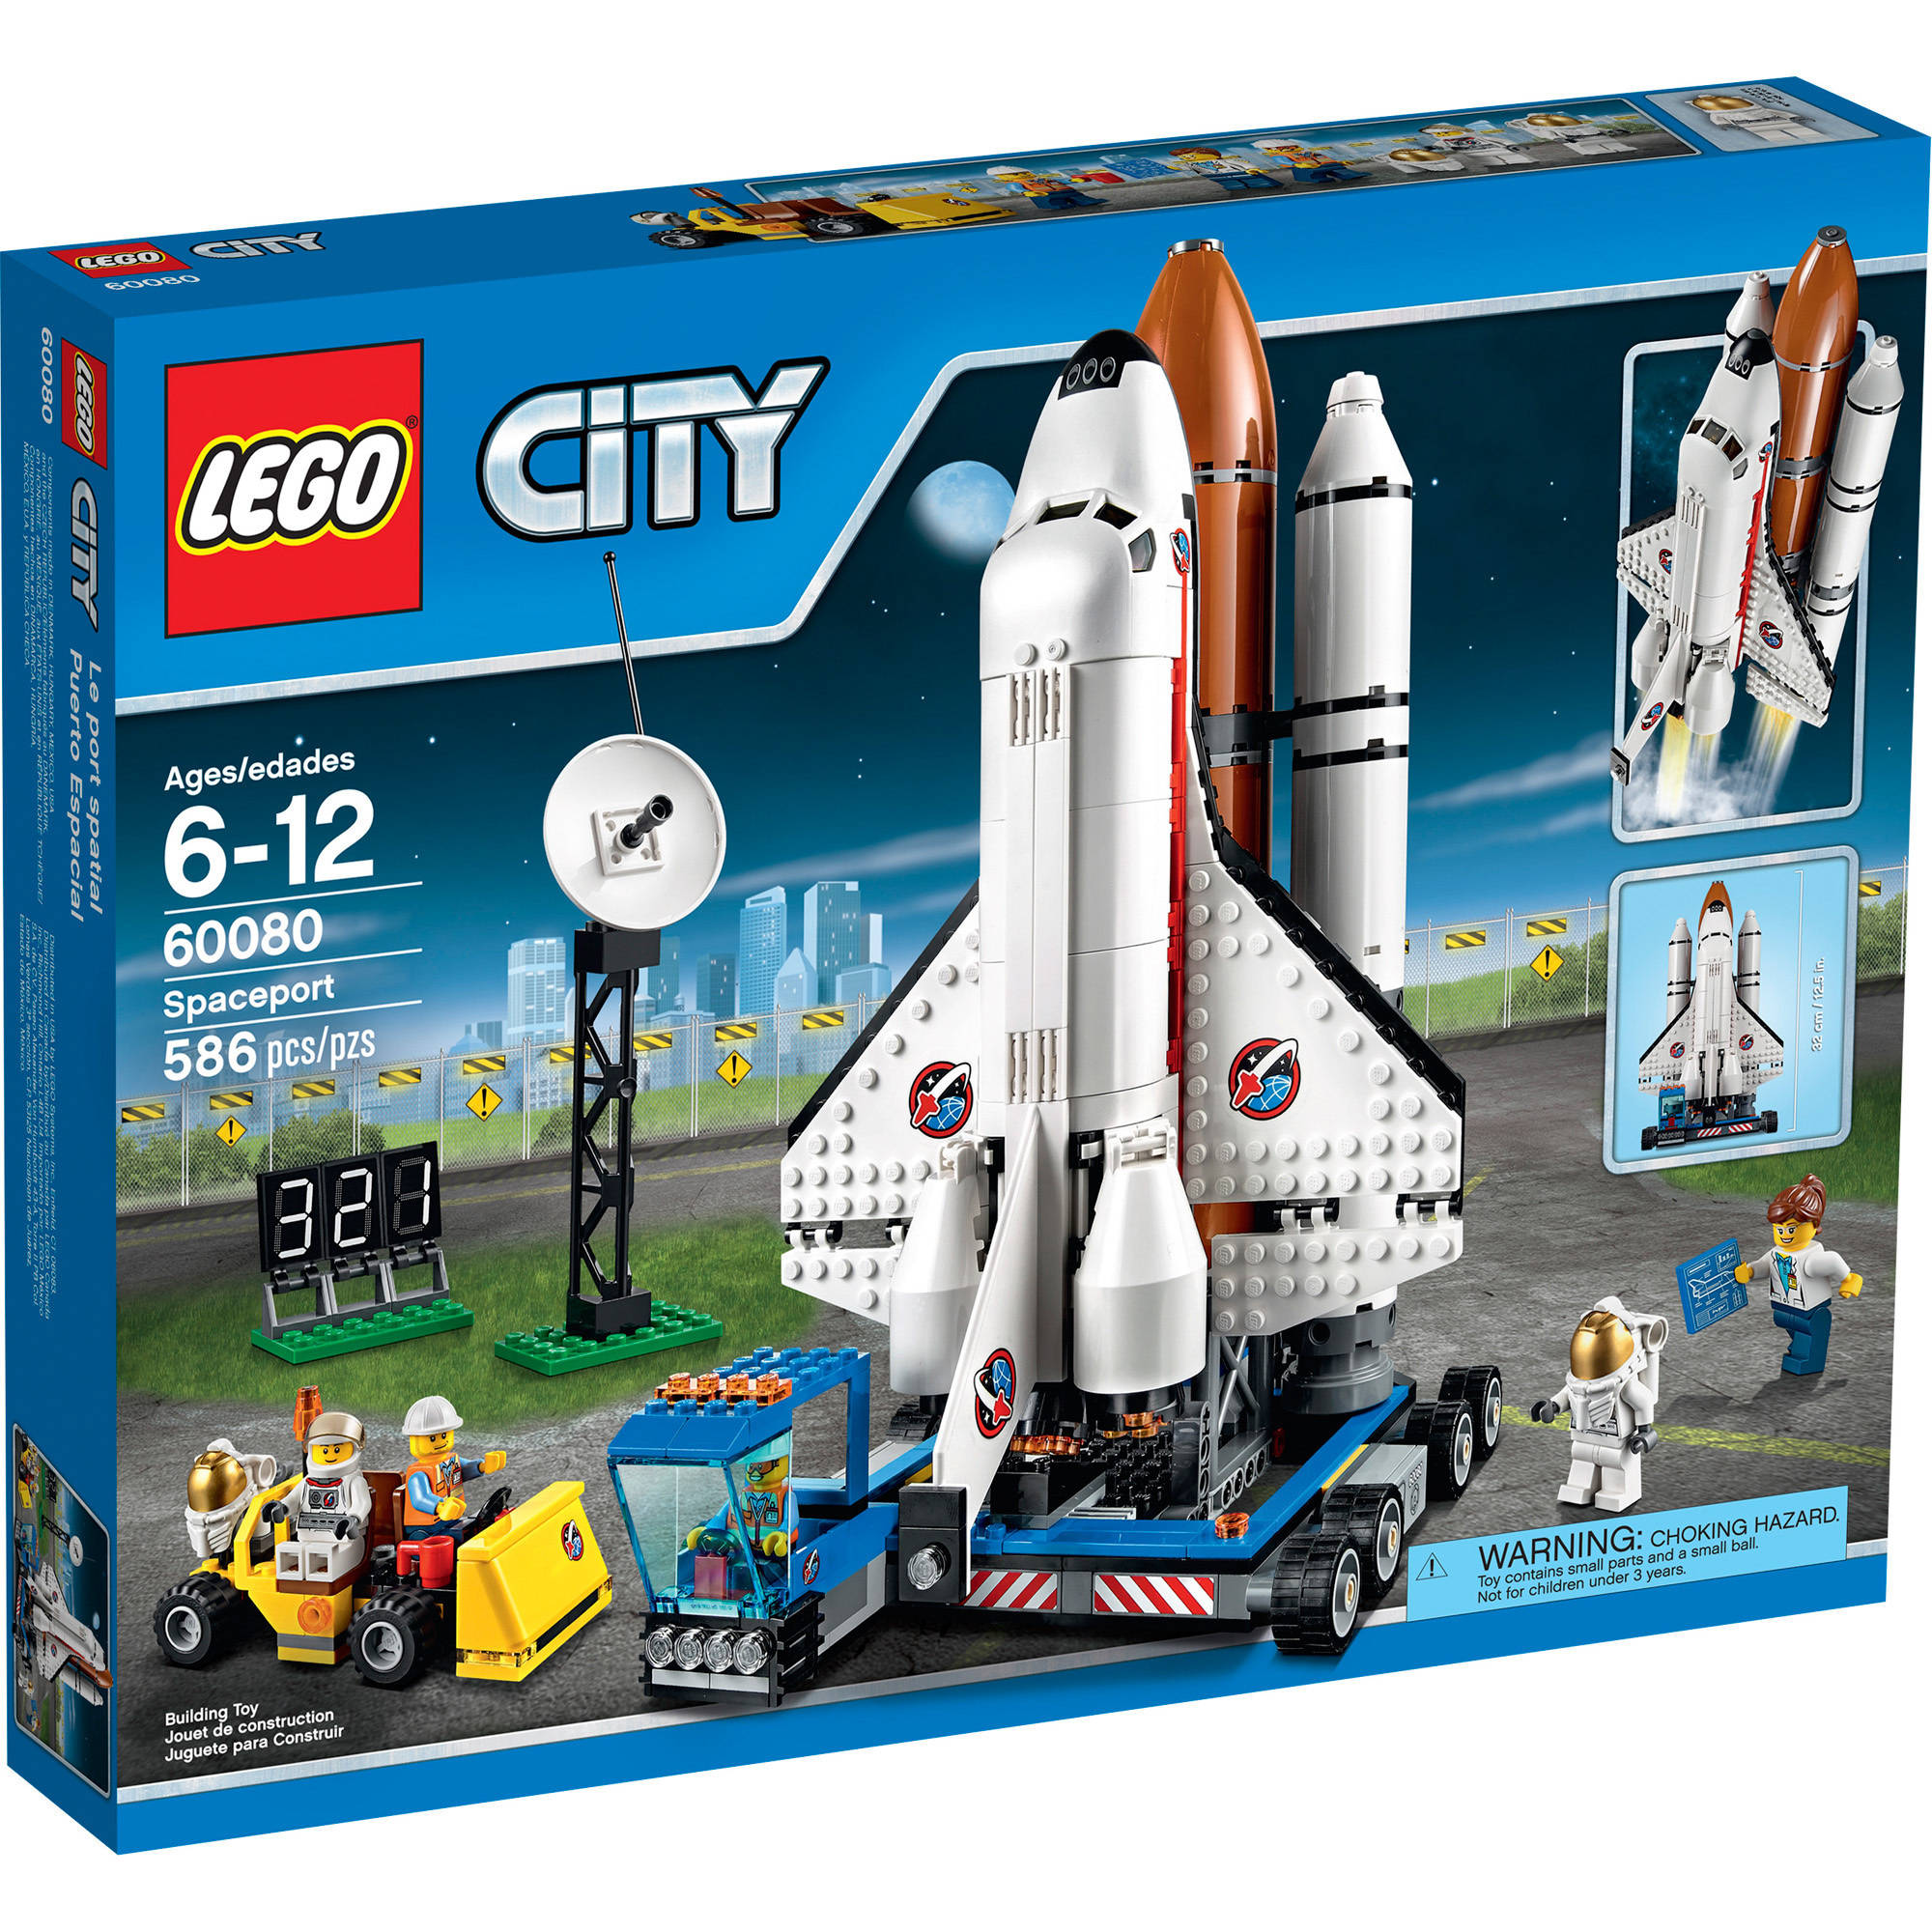 LEGO City Space Port Spaceport, 60080 - Walmart.com ...